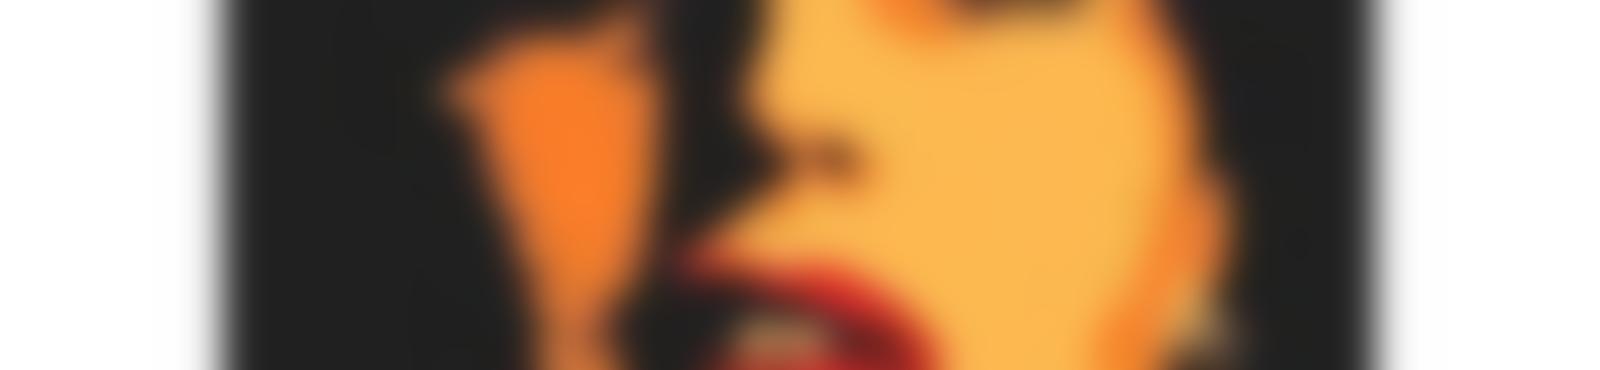 Blurred 6a4436ae 06f6 4726 8325 46f77974a65b